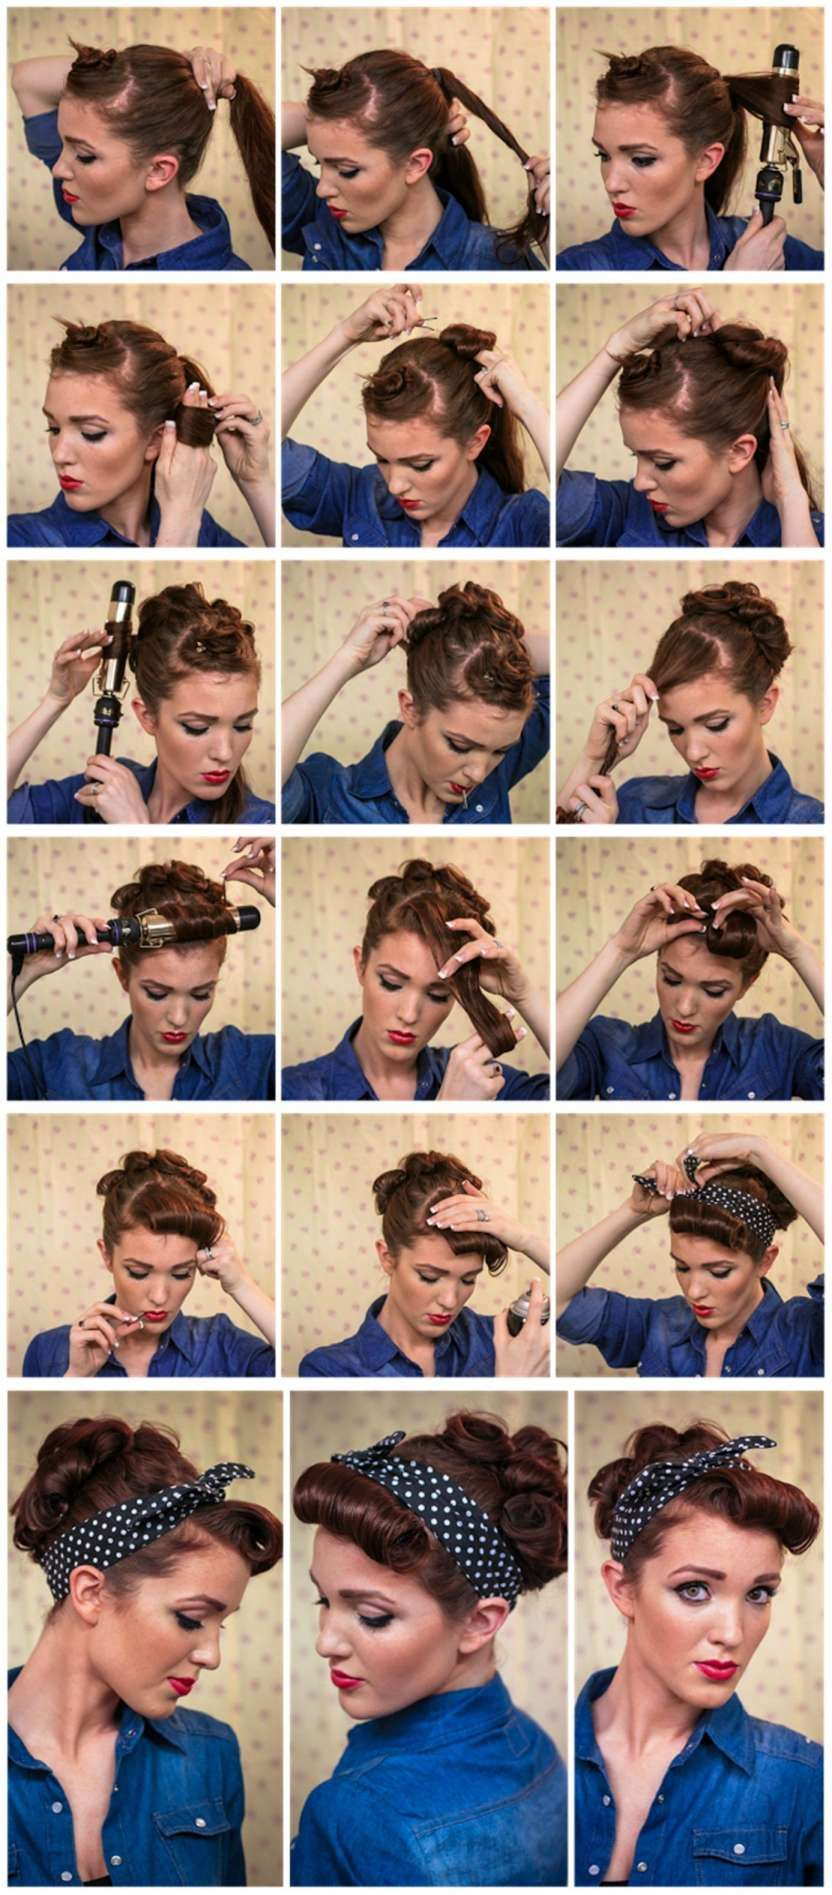 10 Inspiring 1950 Hairstyles Tutorial Photos In 2020 Vintage Hairstyles Tutorial Old Hairstyles 1950s Hair Tutorial